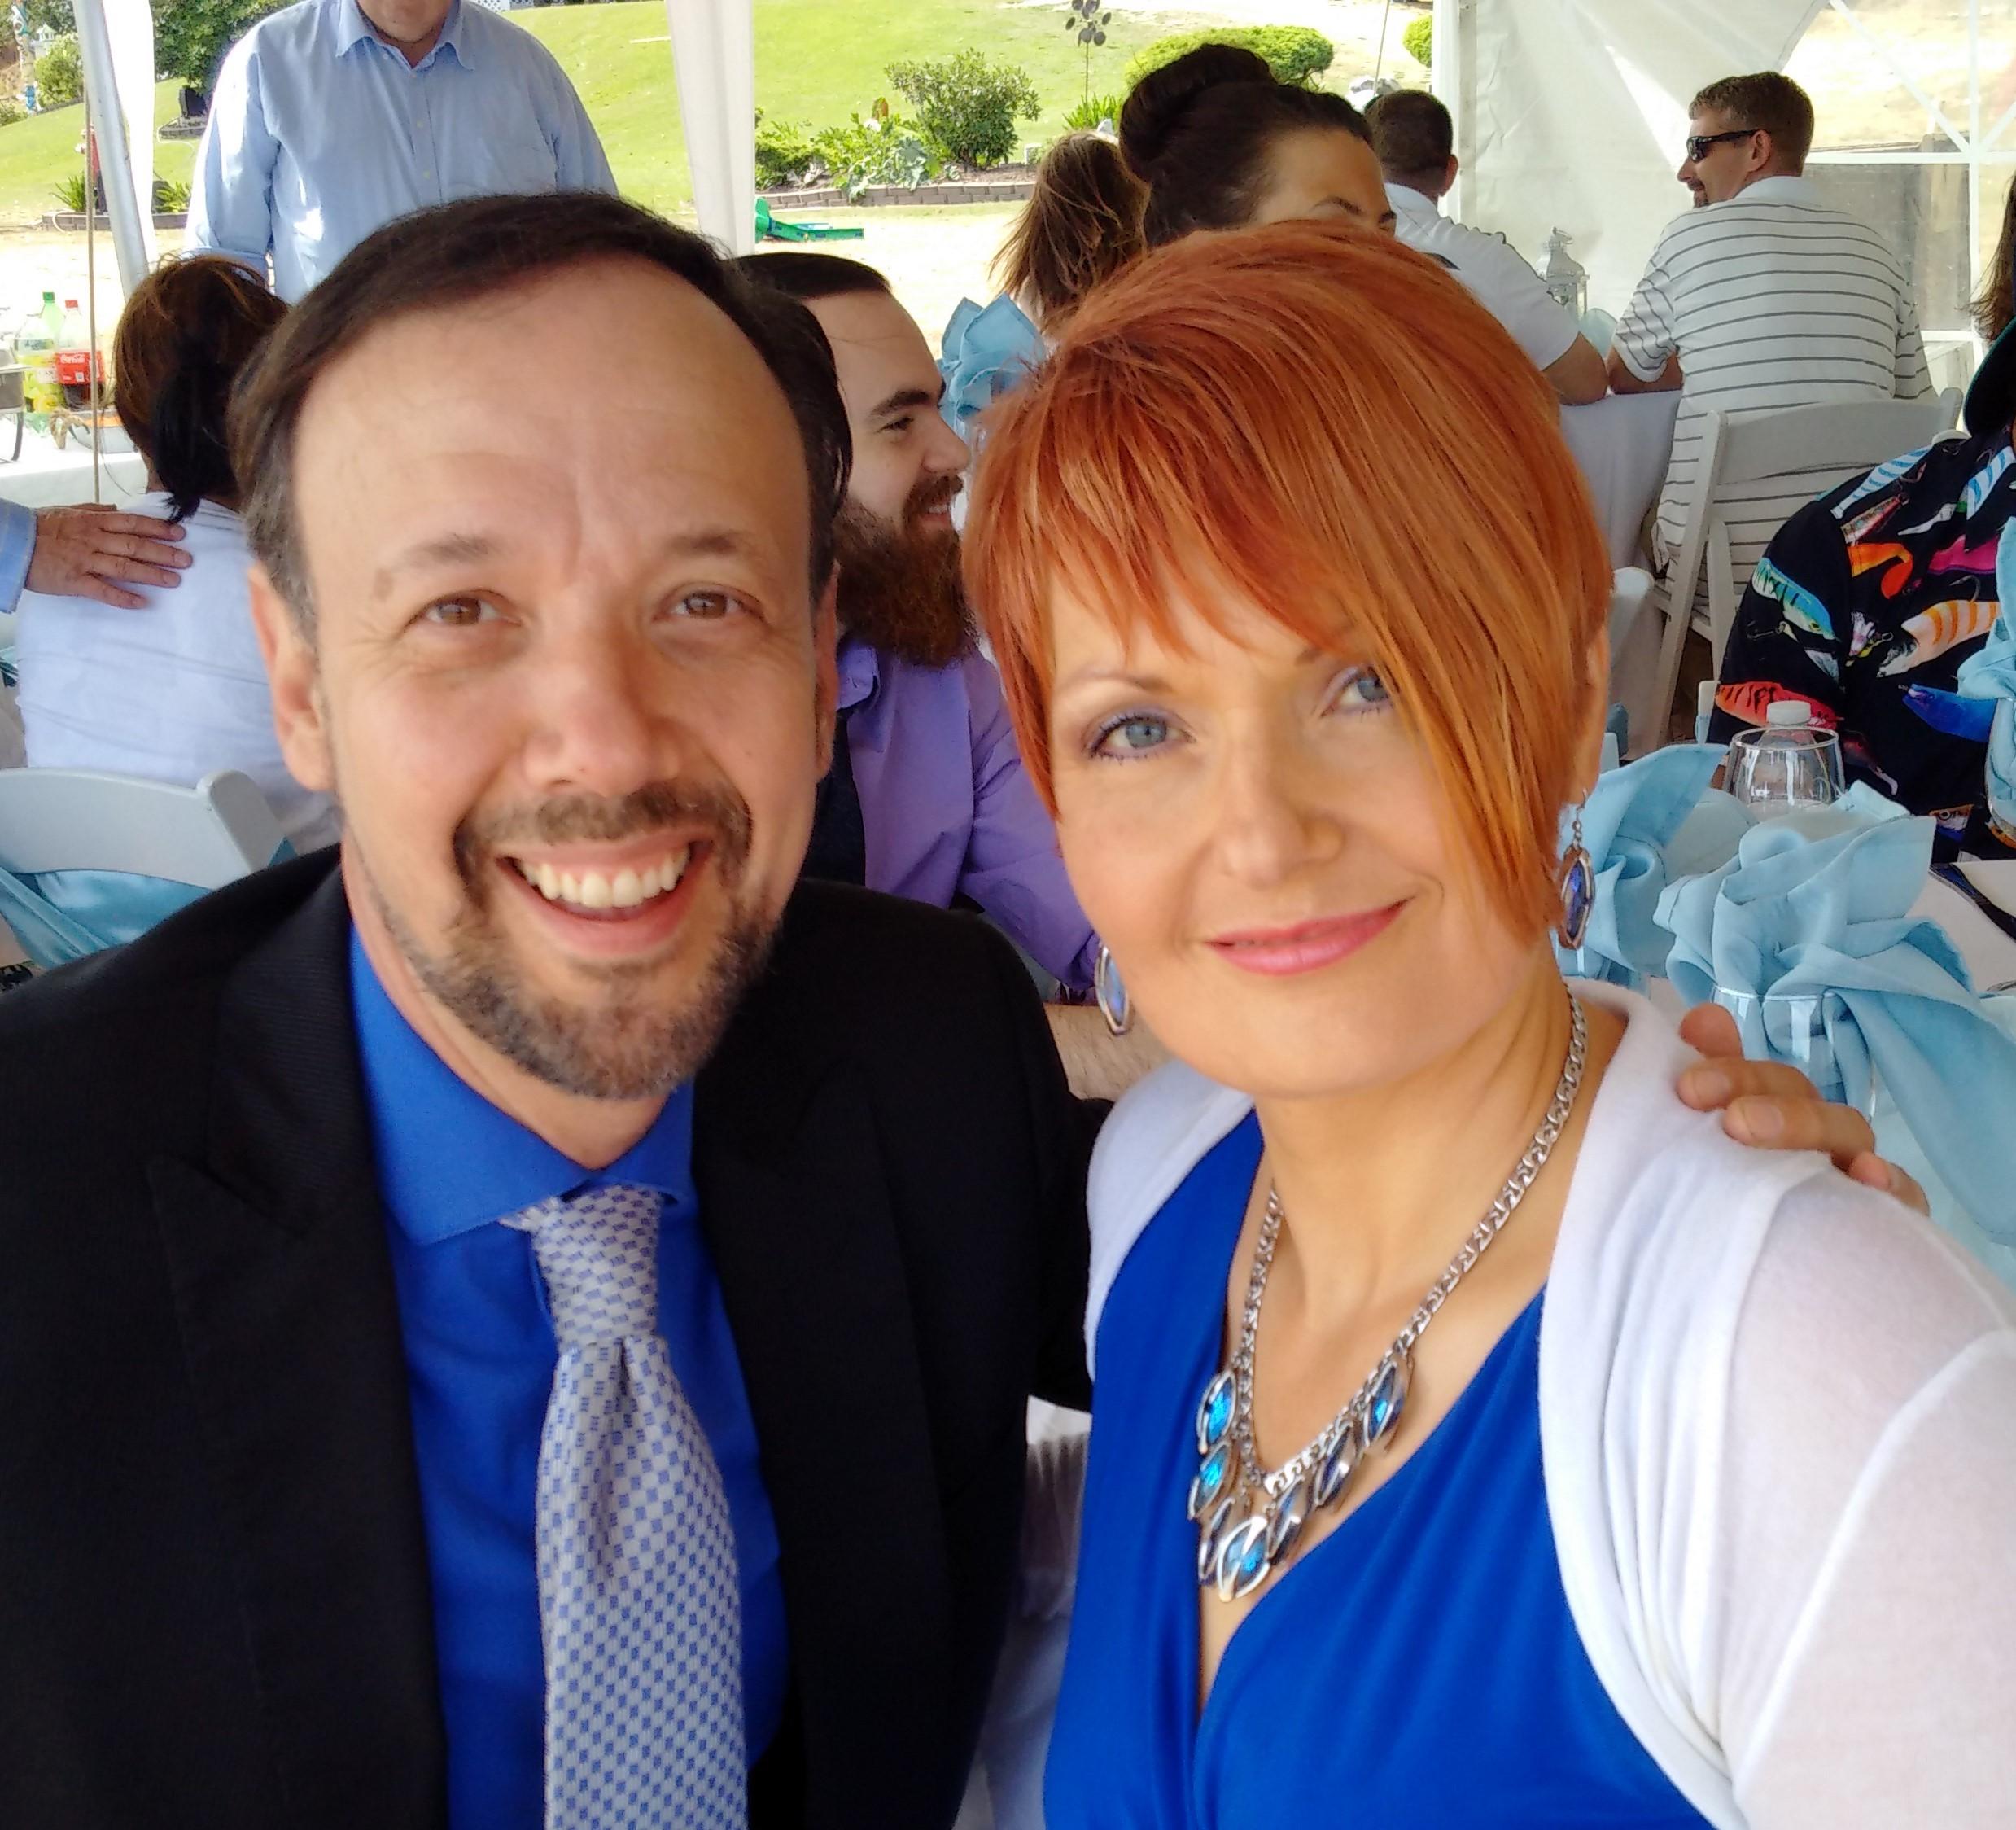 Brent and Barbara